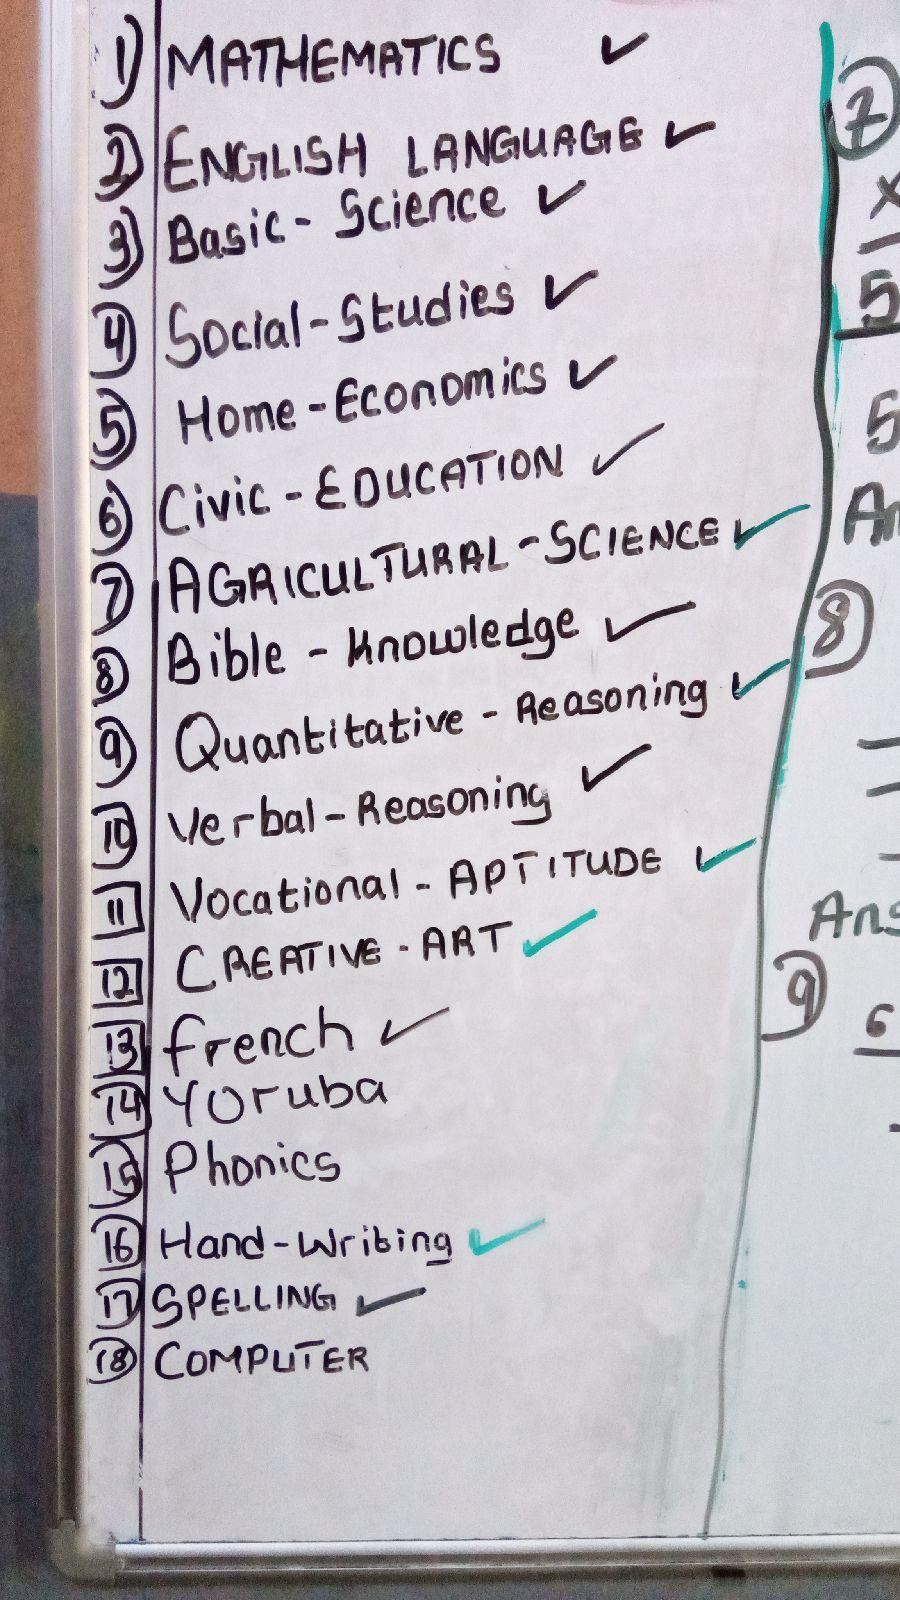 List Of Subjects Suggested For Primary Schools Edu Delight Tutors Tutor Primary School Phonics